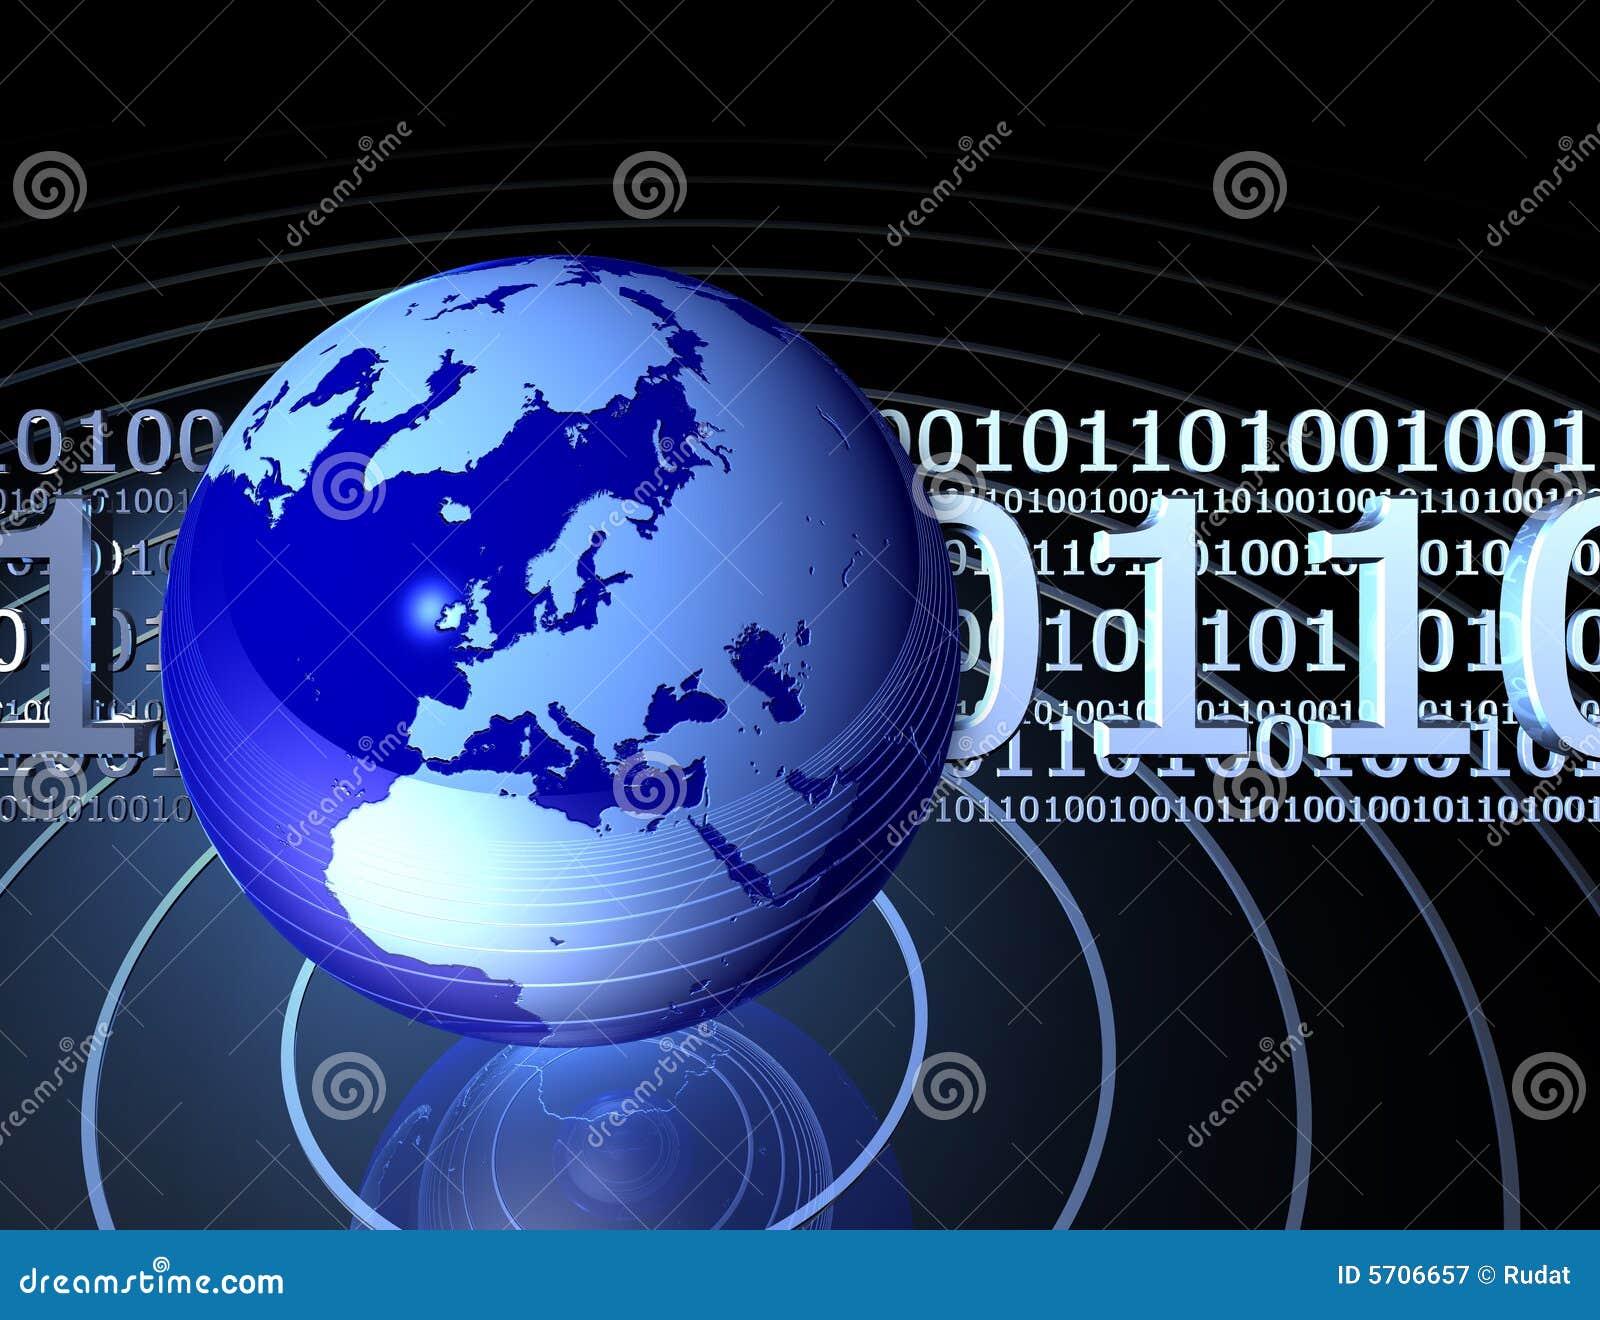 Binary code with globe